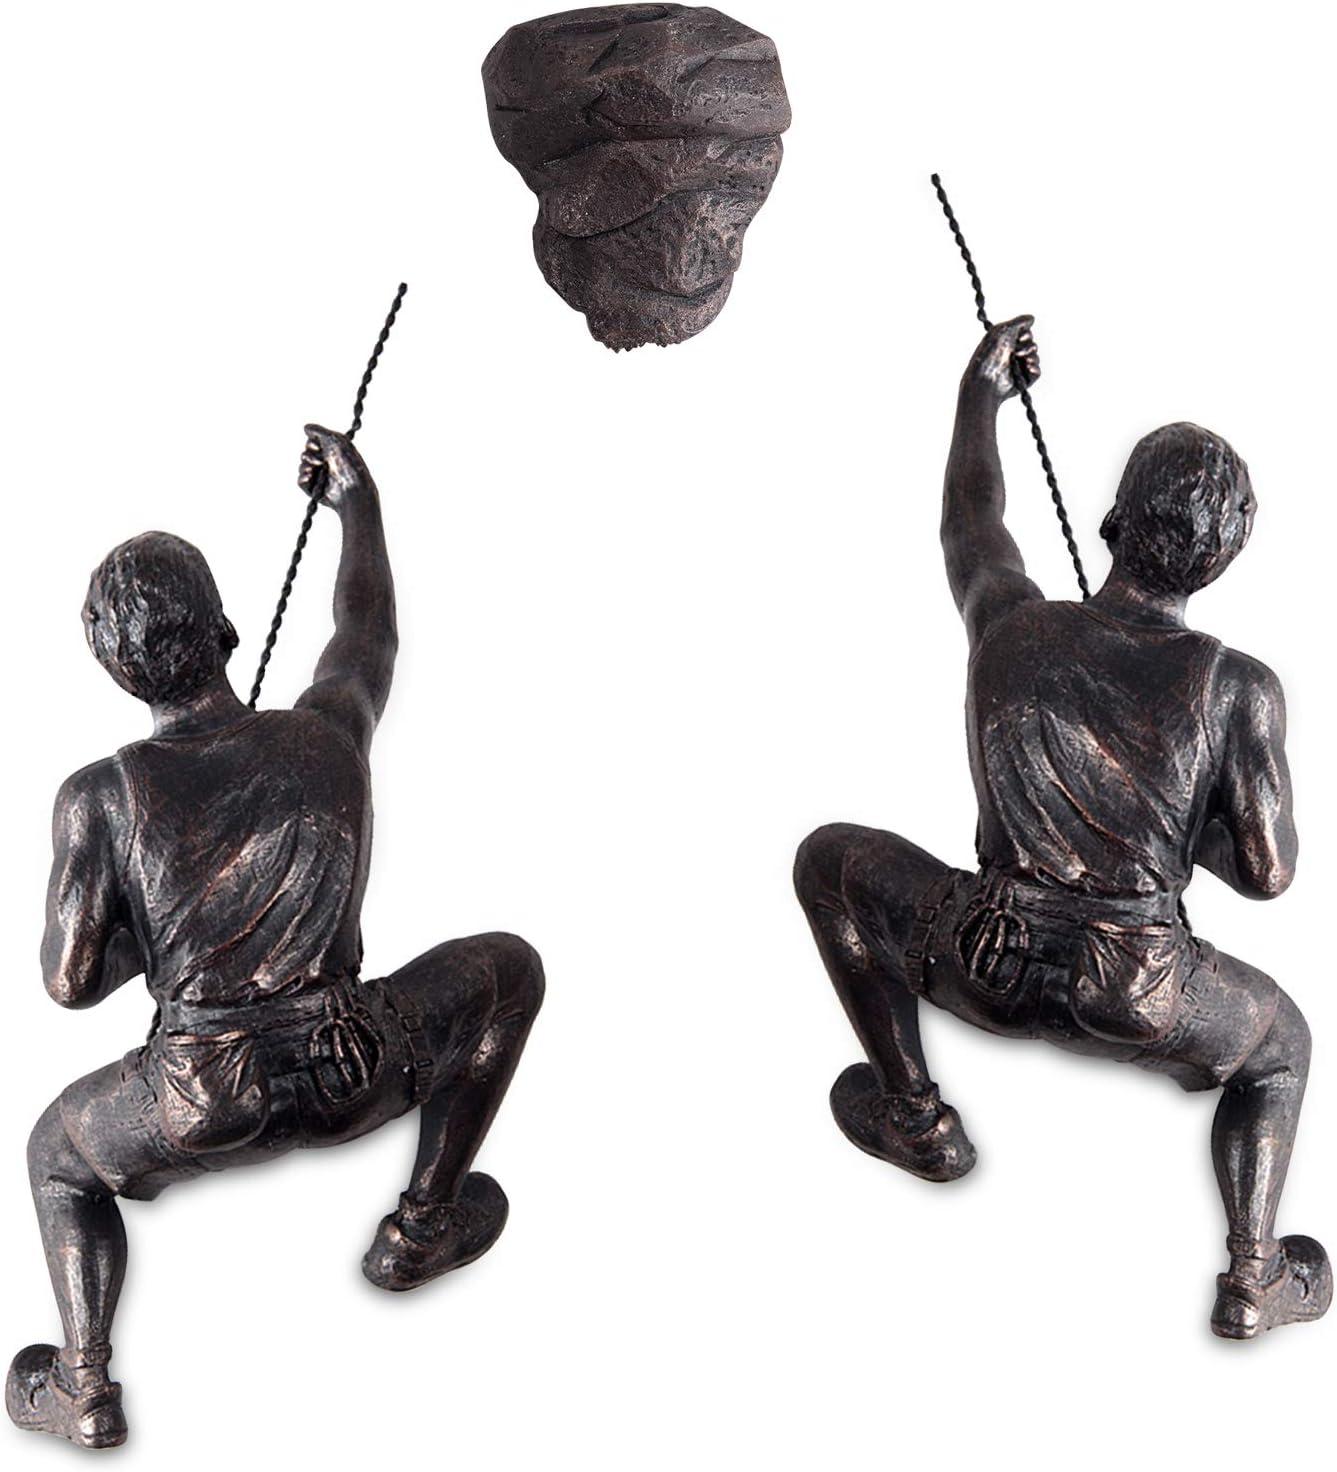 Olpchee Men Climbing Wall Sculpture Resin Art Wall Sculptures Home Decor Vintage Statue Figure Kit for Home Office Shop 3Pcs/Set (Copper Black)